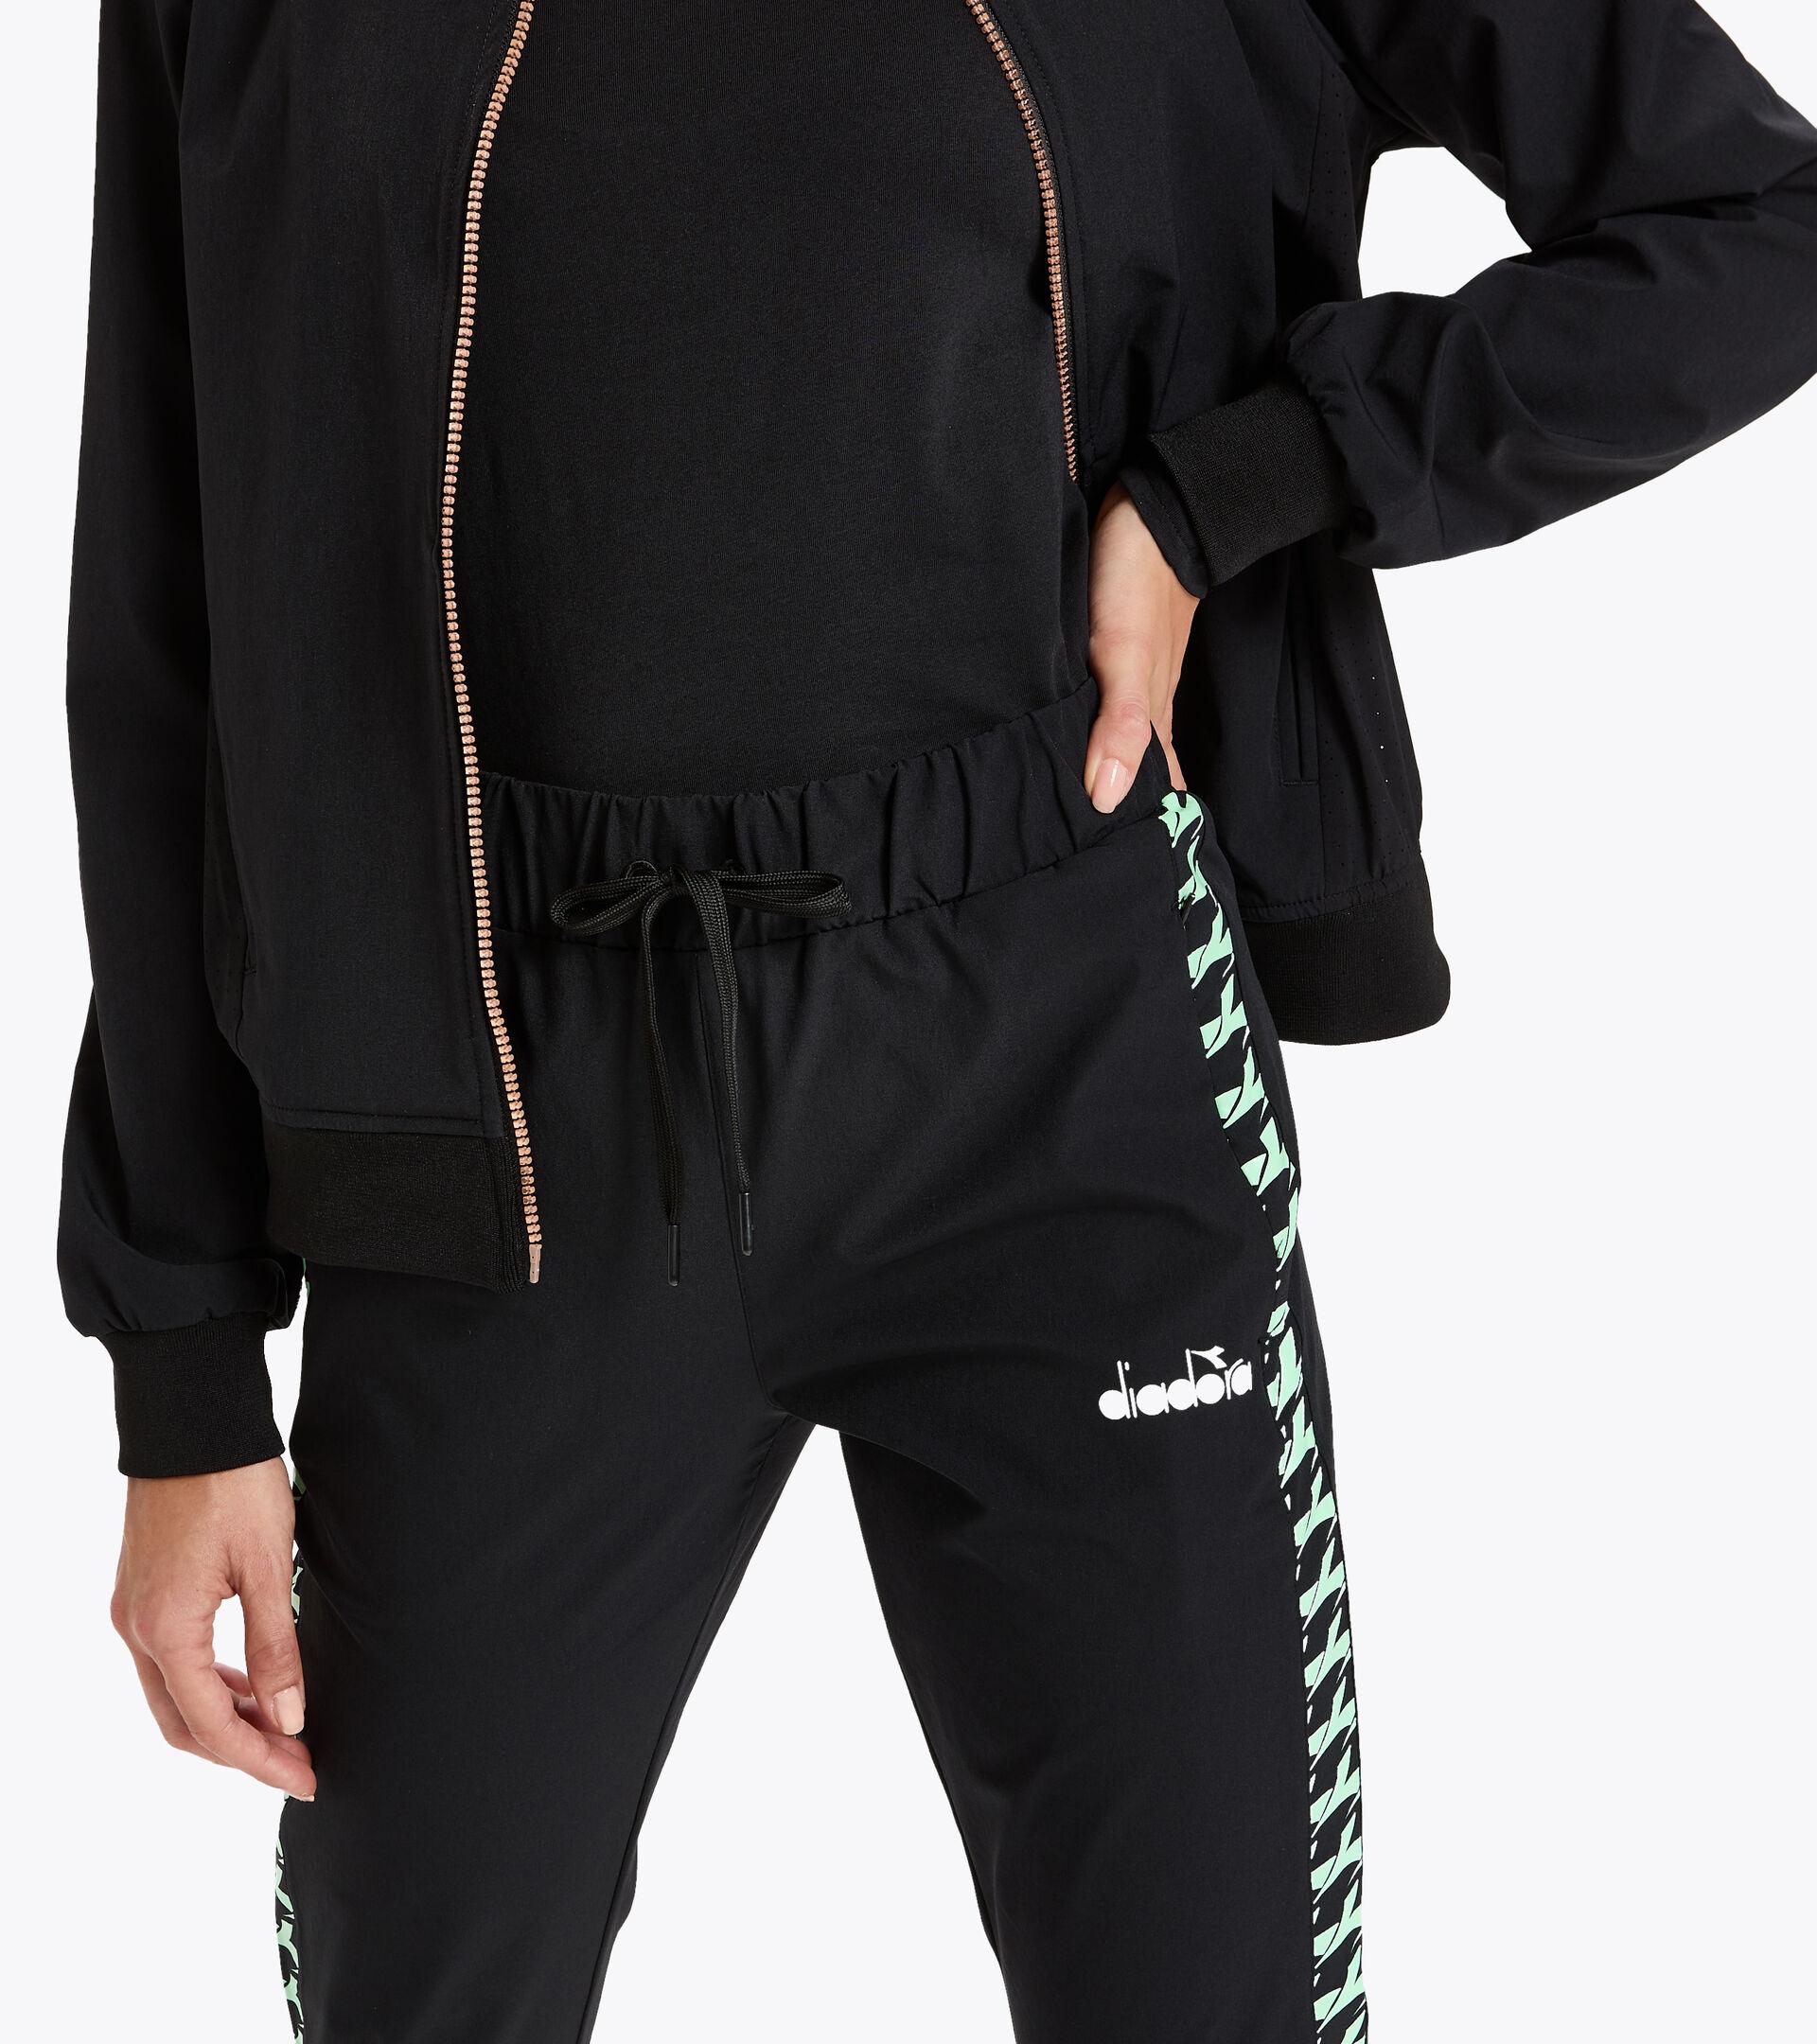 Apparel Sport DONNA L. PANTS CHALLENGE BLACK Diadora